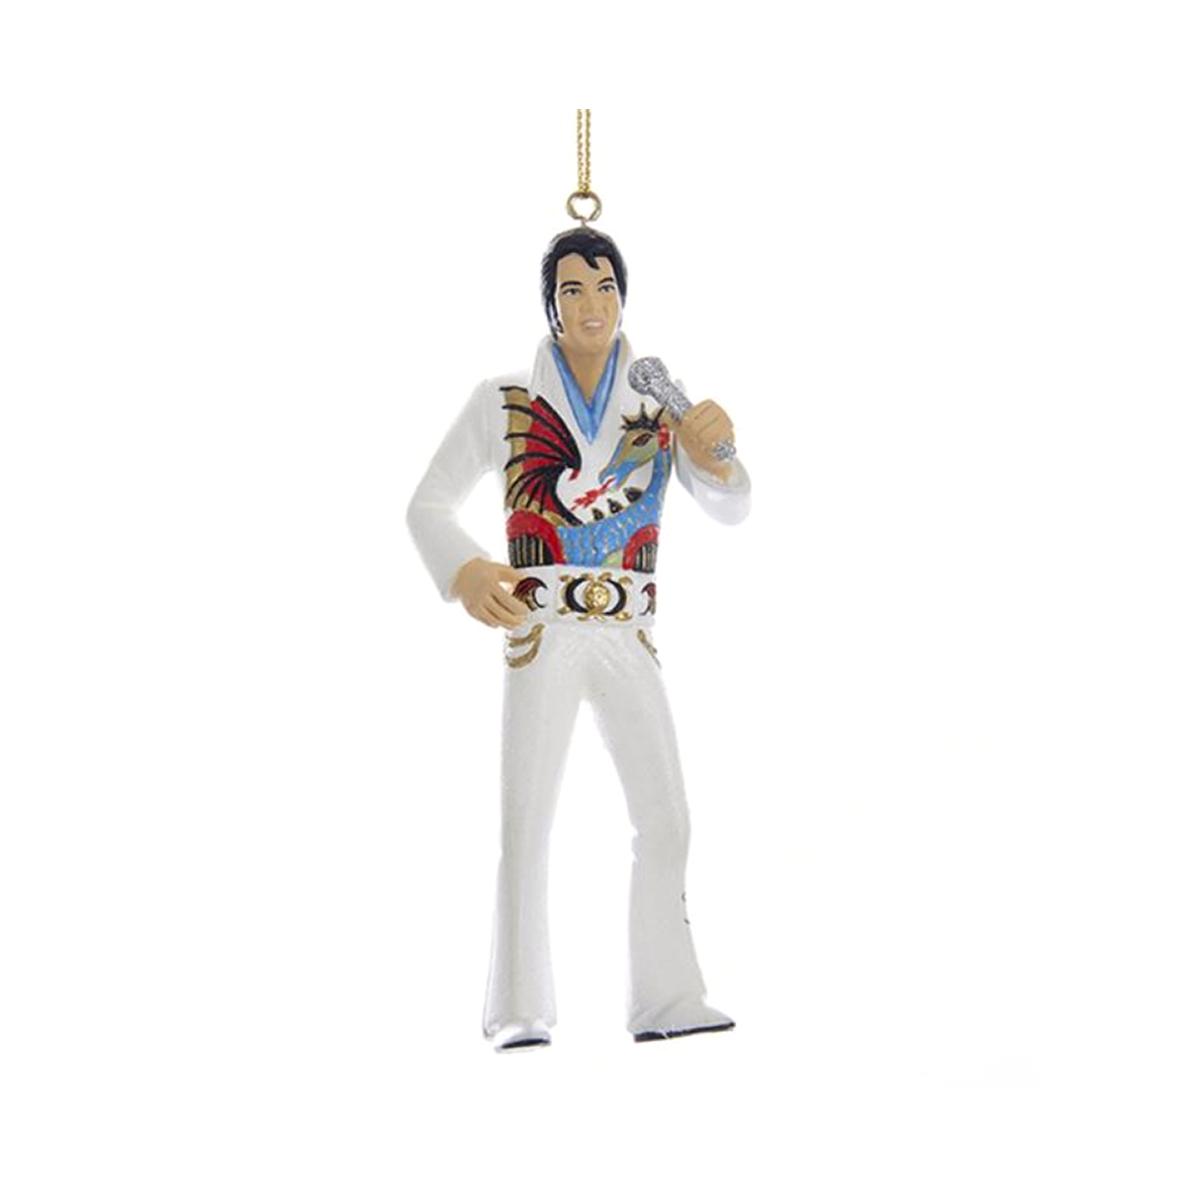 Elvis Presley Dragon Jumpsuit Ornament